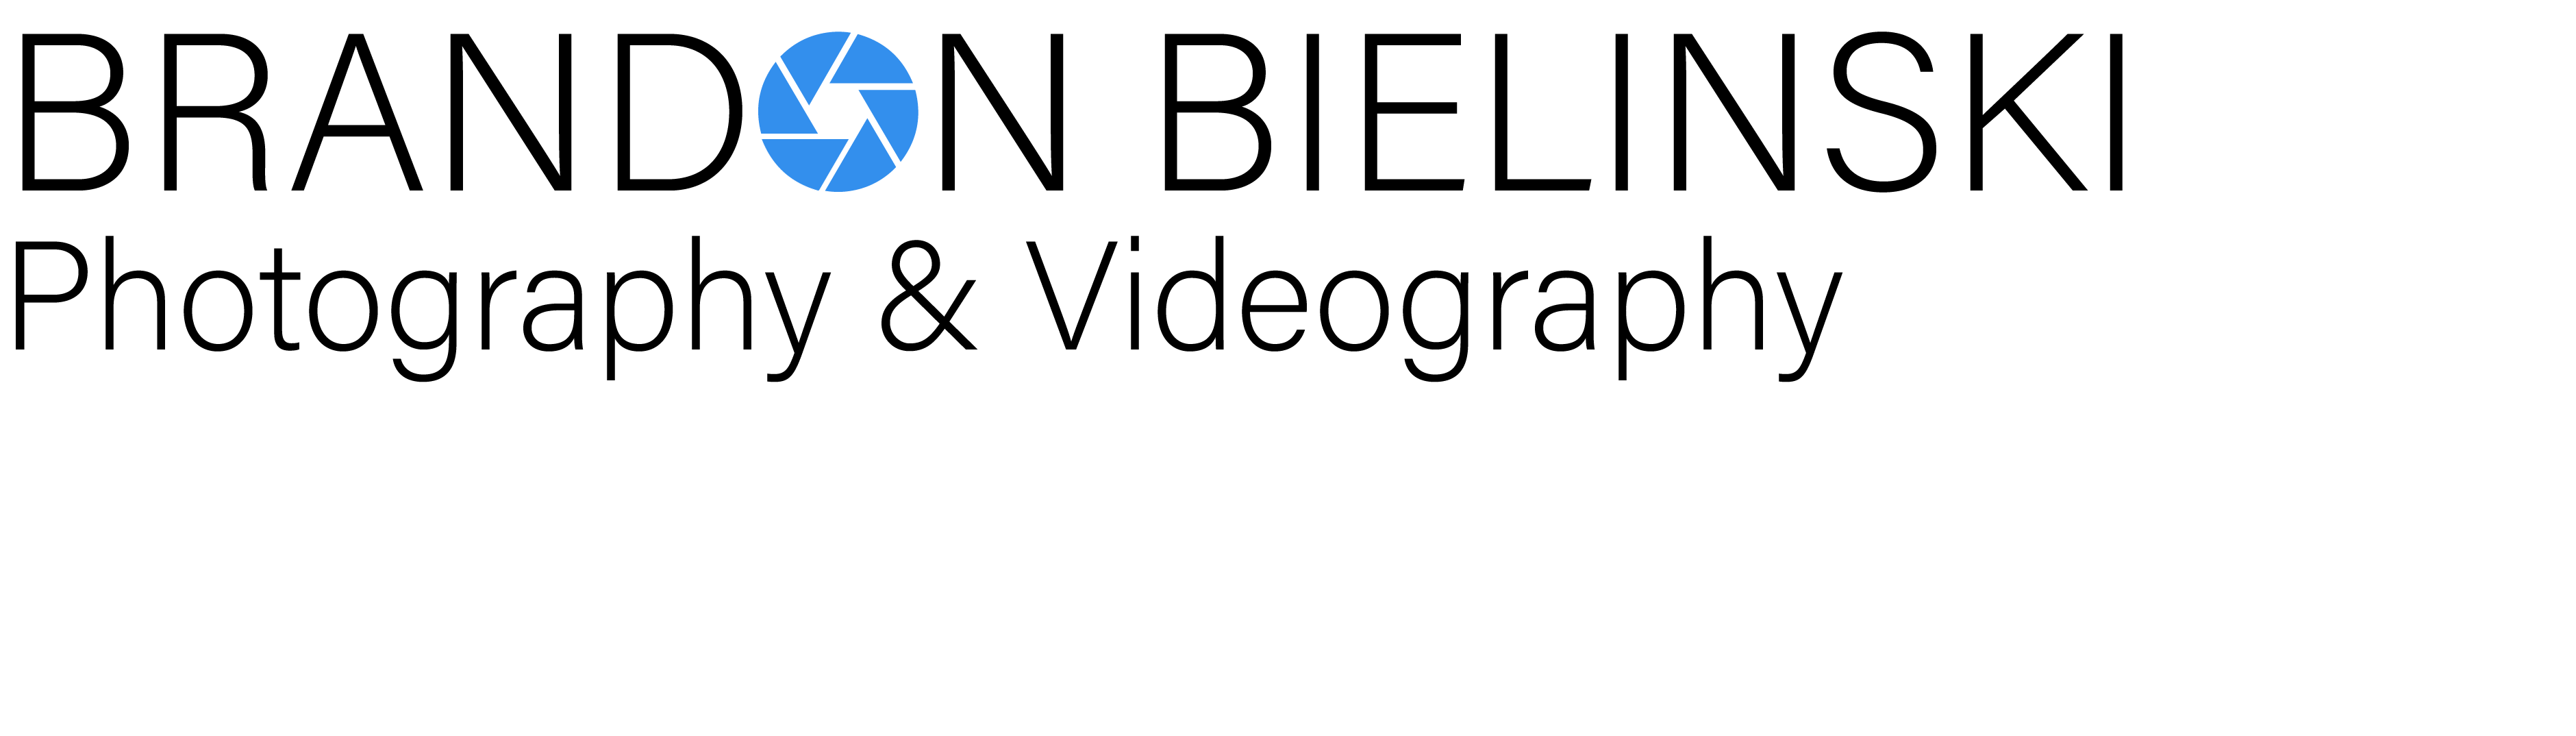 Brandon Bielinski Photography & Videography floor plan Mystic floor plan Fall River floor plan New Bedford floor plan Worcester floor plan Charlestown floor plan East Greenwich floor plan Narragansett floor plan Newport floor plan Pawtucket floor plan Providence floor plan South Kingstown floor plan Warwick floor plan Westerly